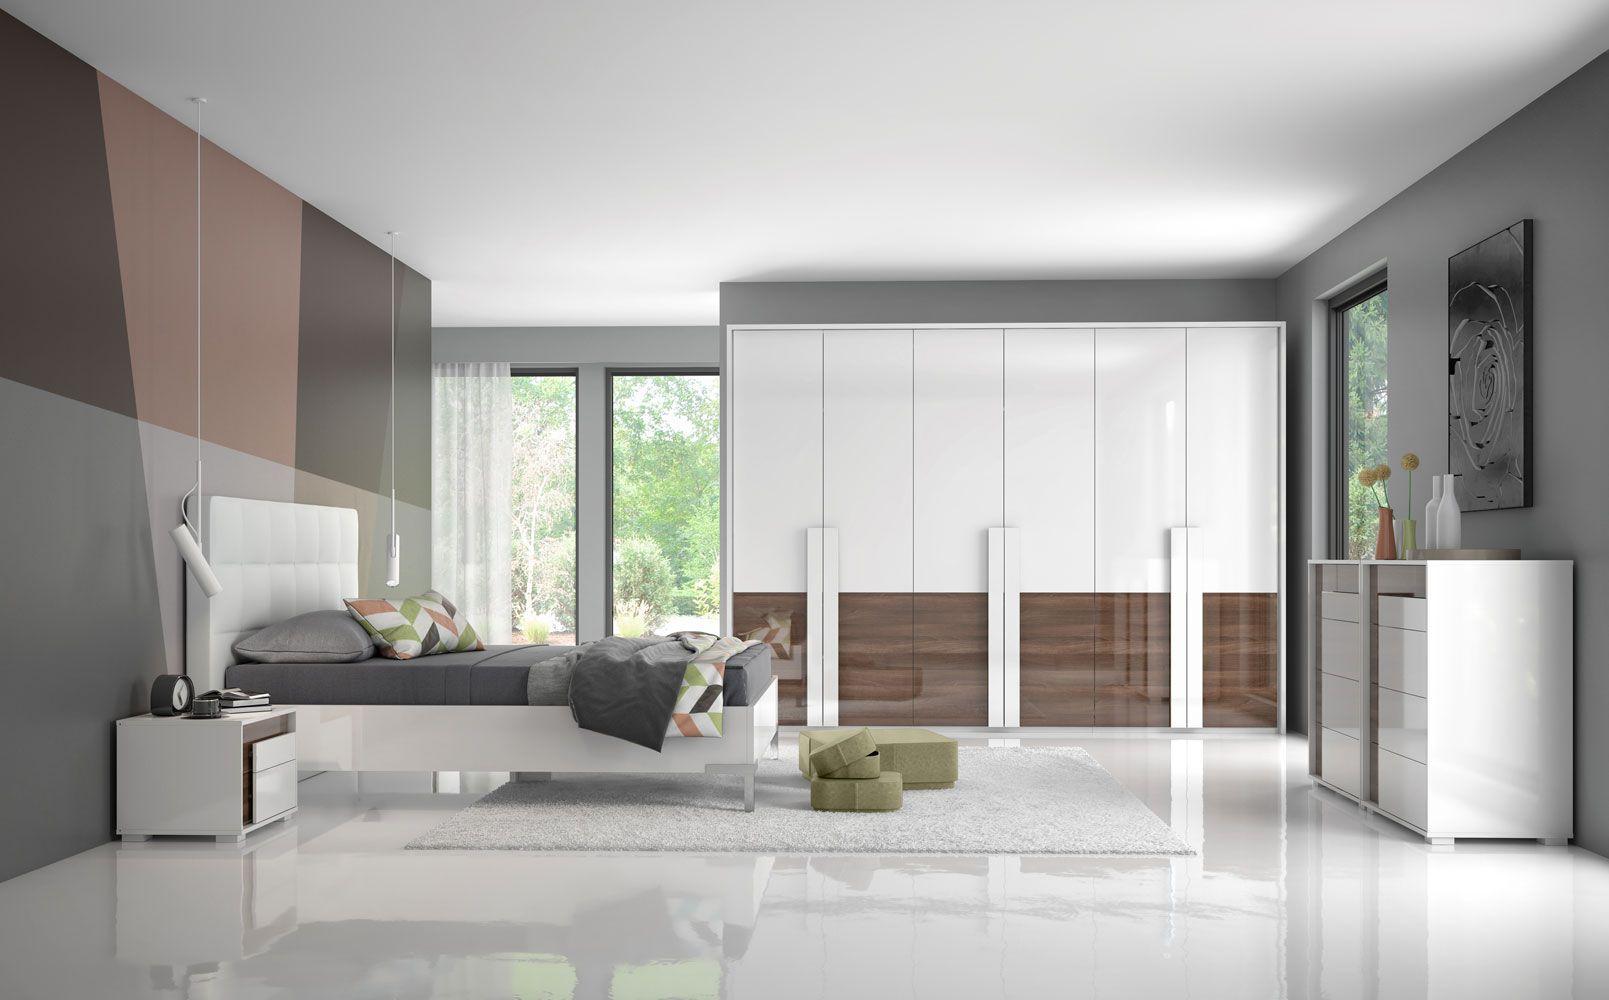 Schlafzimmer Komplett Set B Afega 9 Teilig Farbe Weiss Hochglanz Nuss Hochglanz Inkl Led Rahmen Fur Kleiderschrank